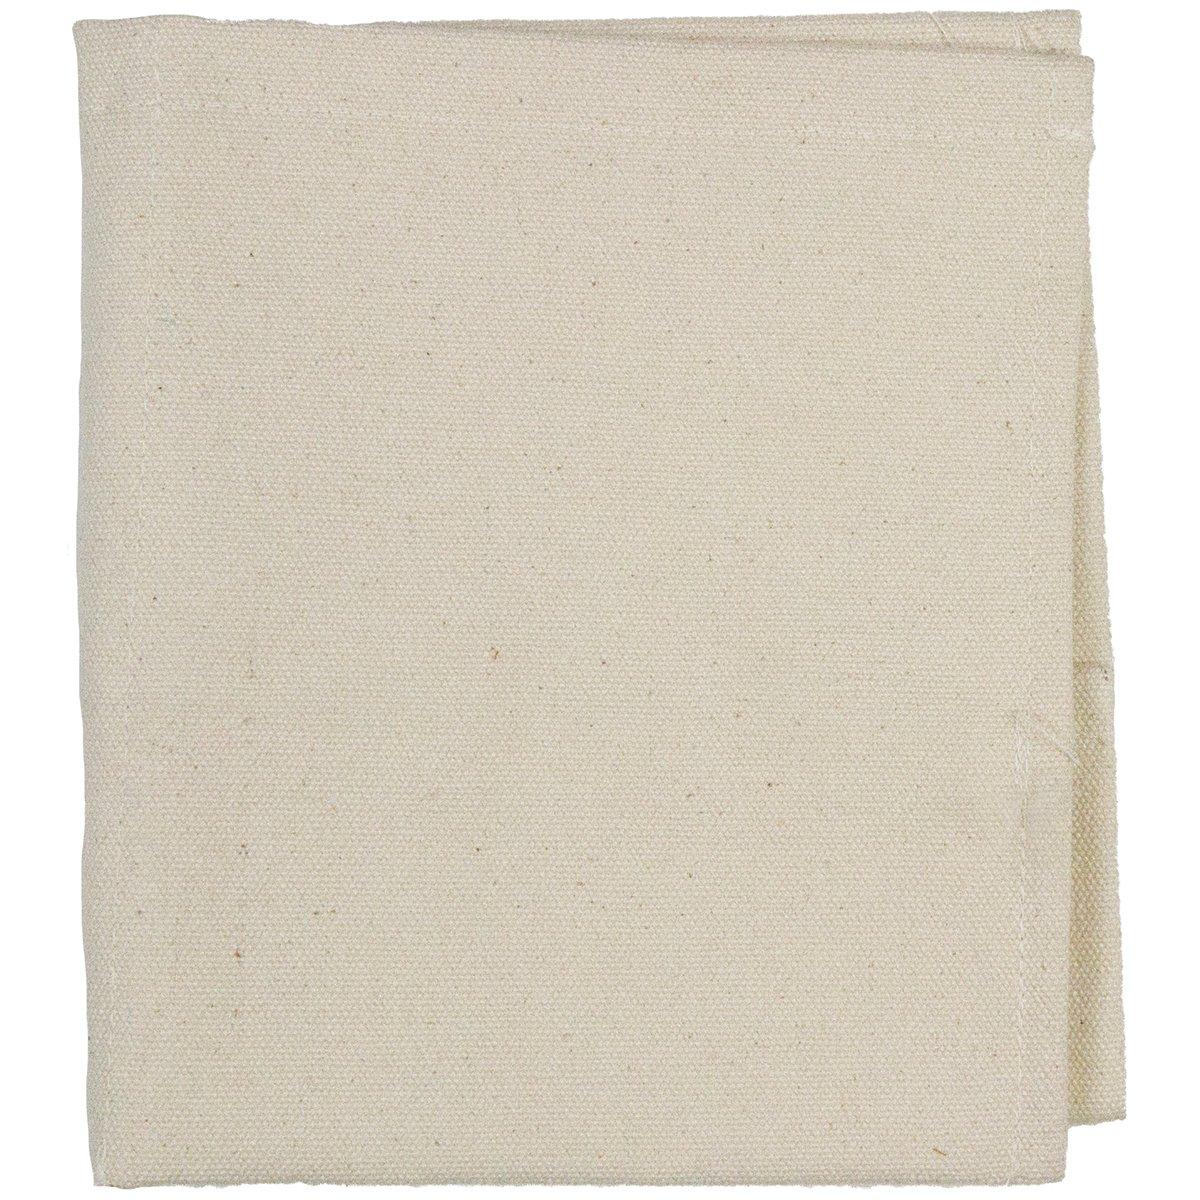 Lienzo Corp Canvas cartera, 5 17,8 (12,7 x 17,8 5 cm, Natural d0b38d